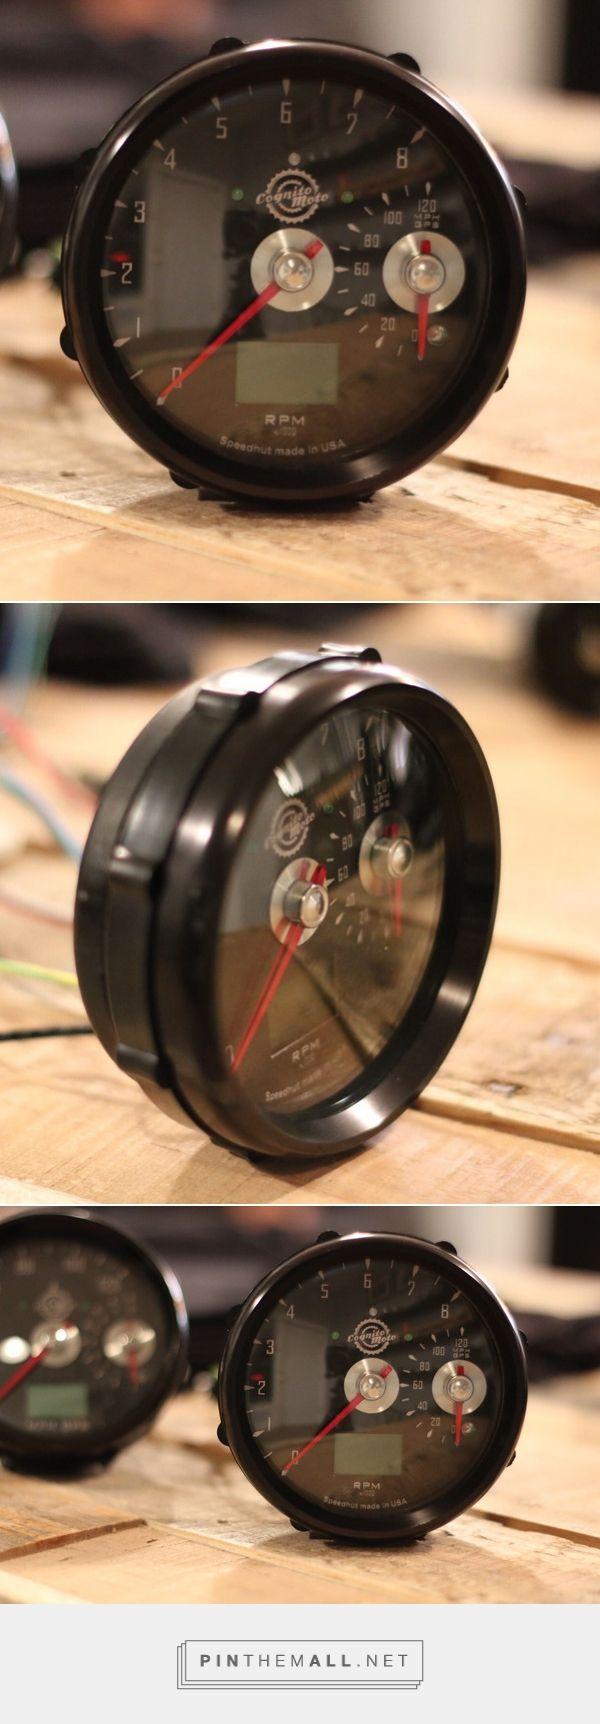 Retro style single gauge.